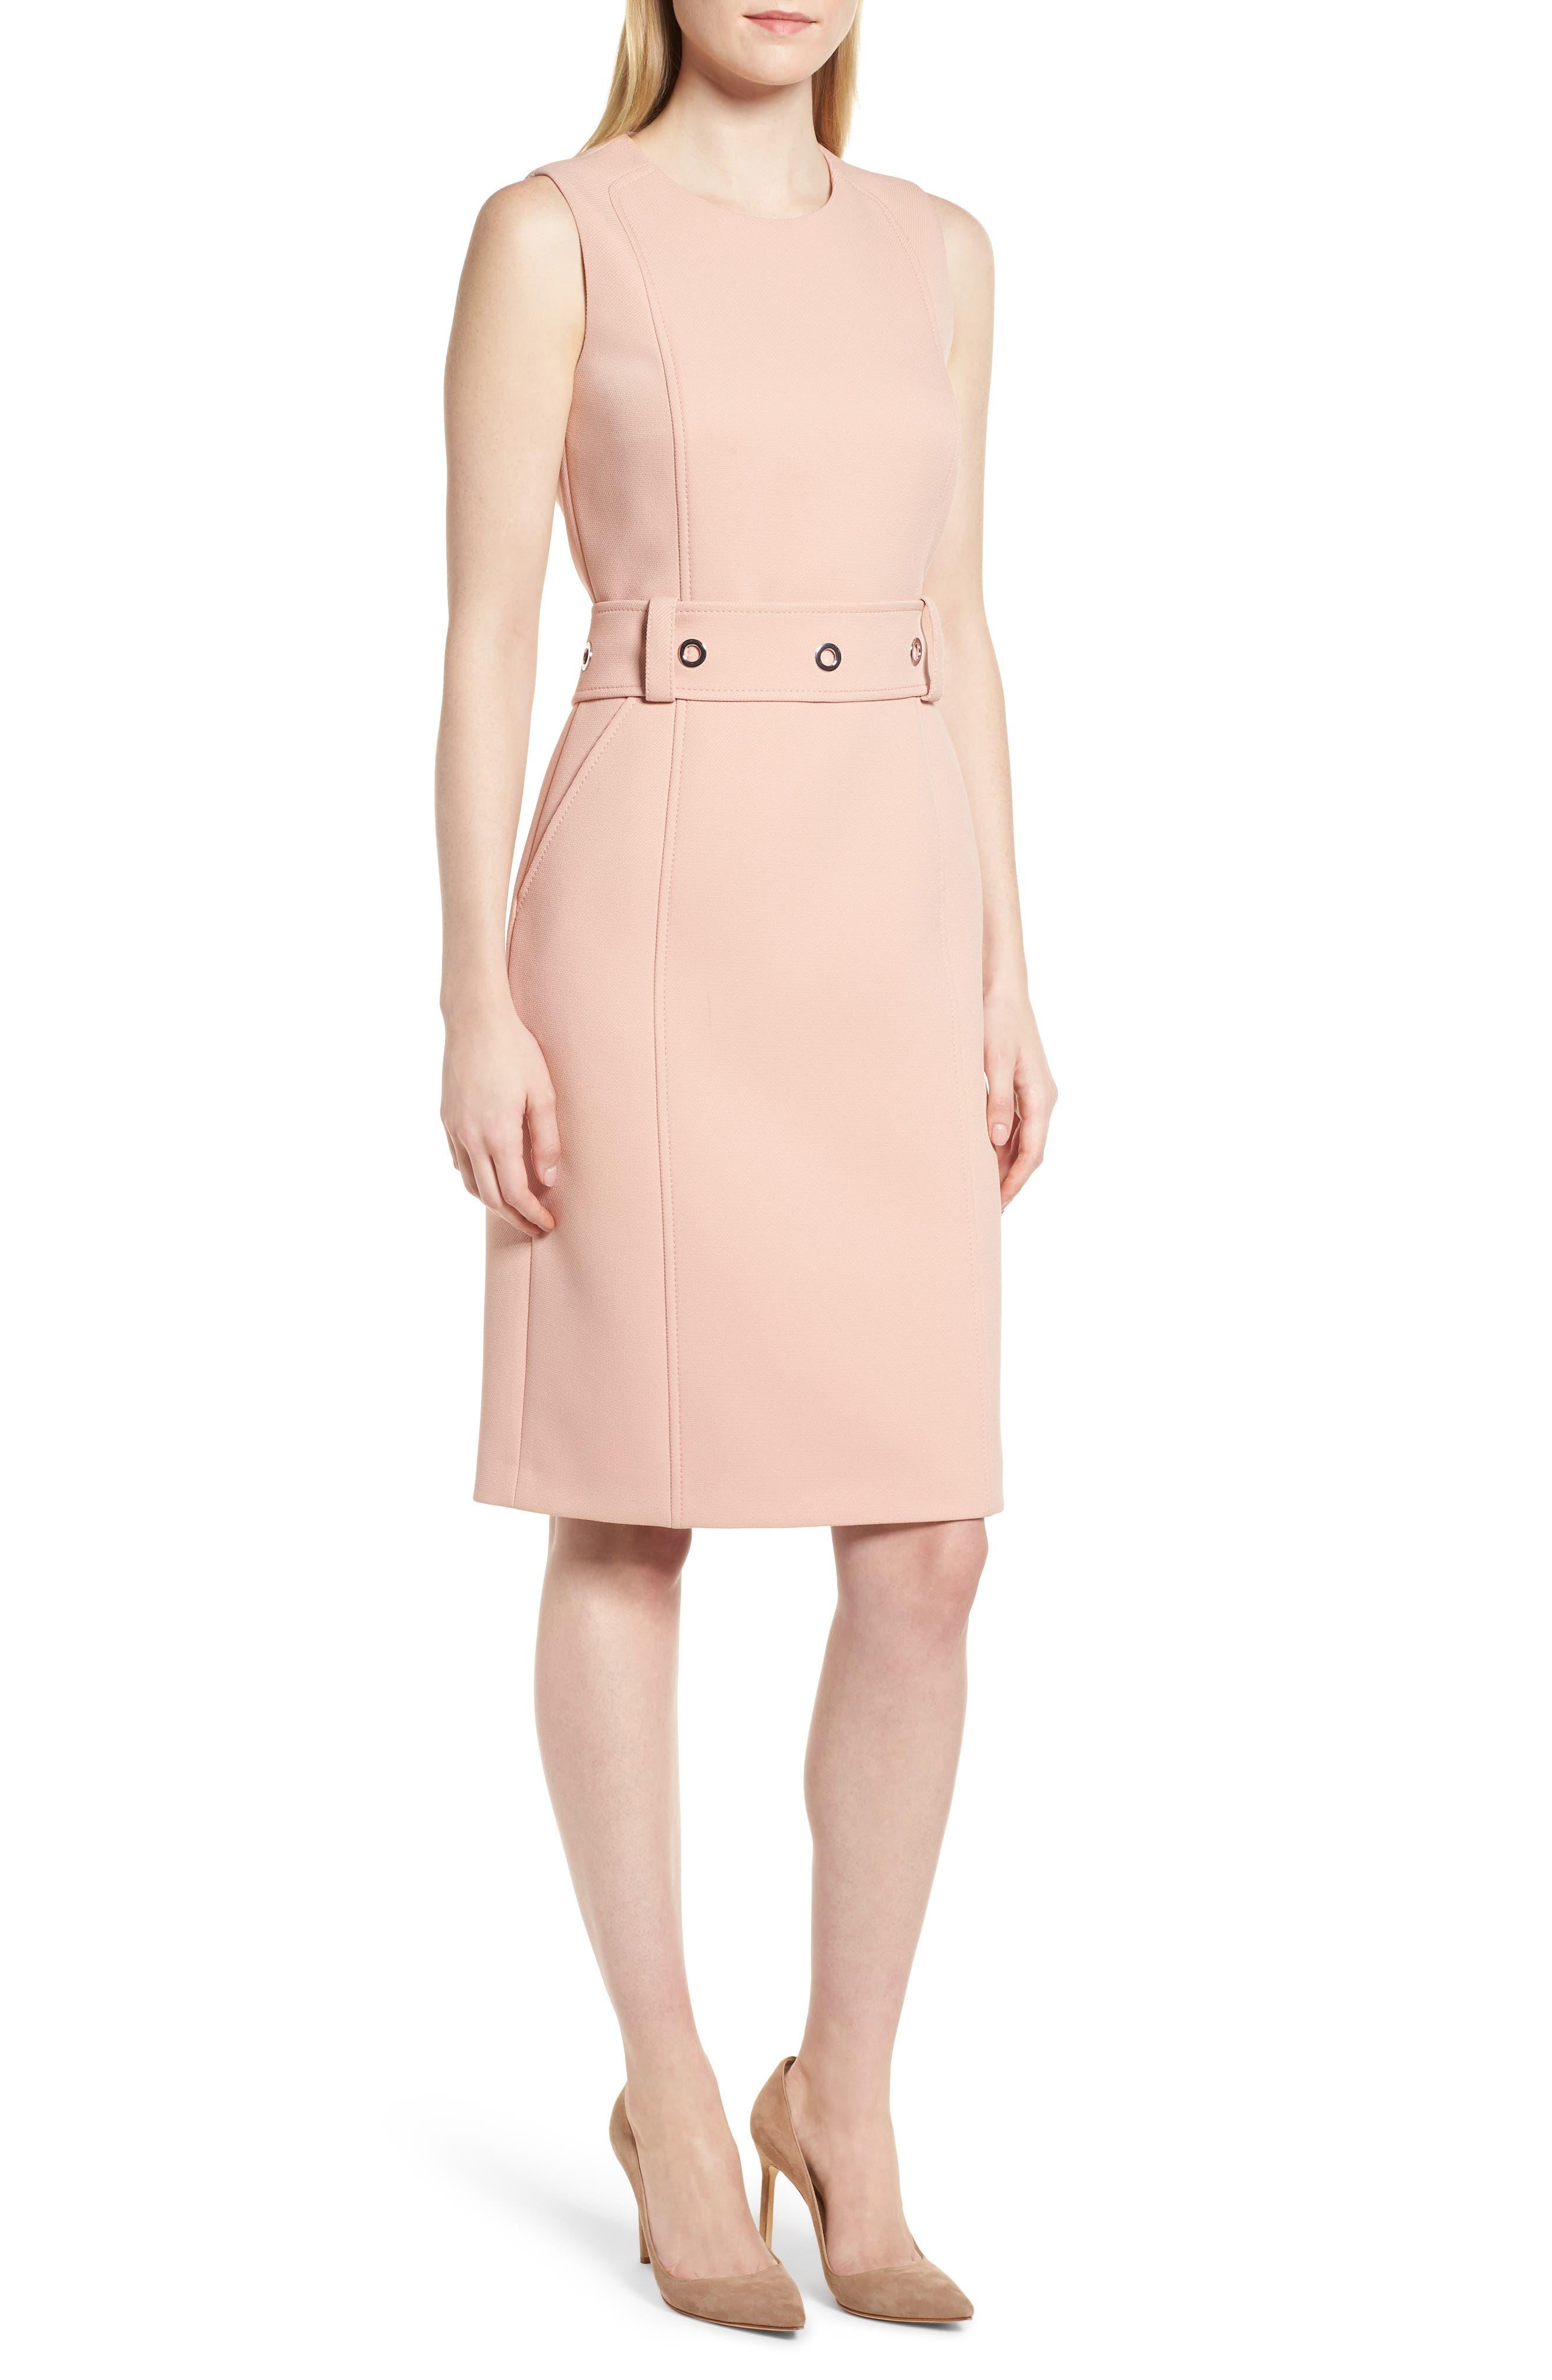 Duleama Compact Twill Dress,                             Main thumbnail 1, color,                             682